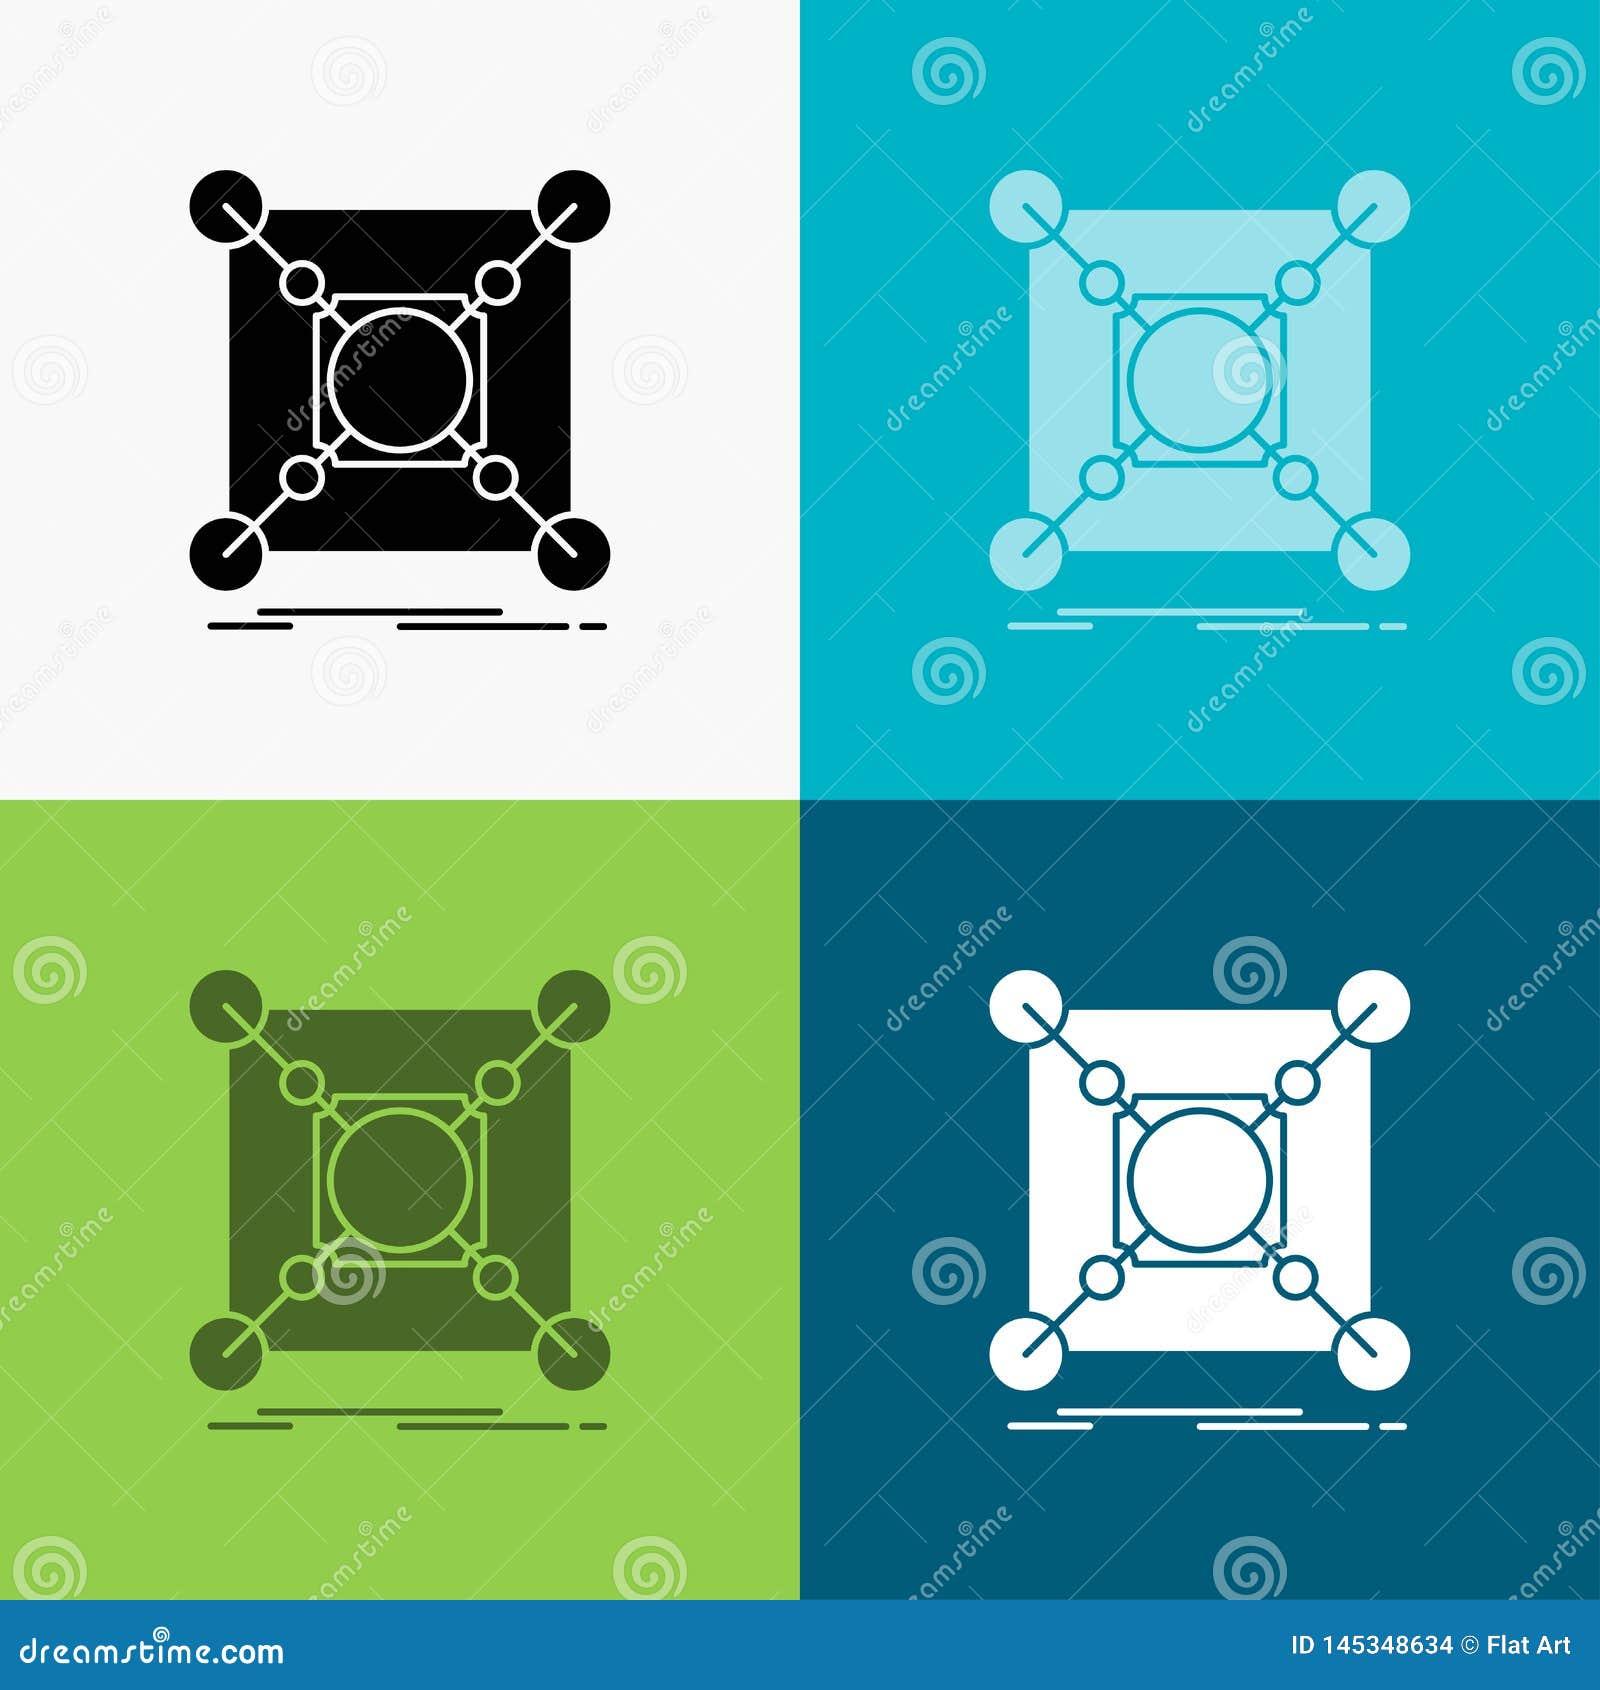 Base, centro, conex?o, dados, ?cone do cubo sobre o v?rio fundo projeto do estilo do glyph, projetado para a Web e o app Vetor do